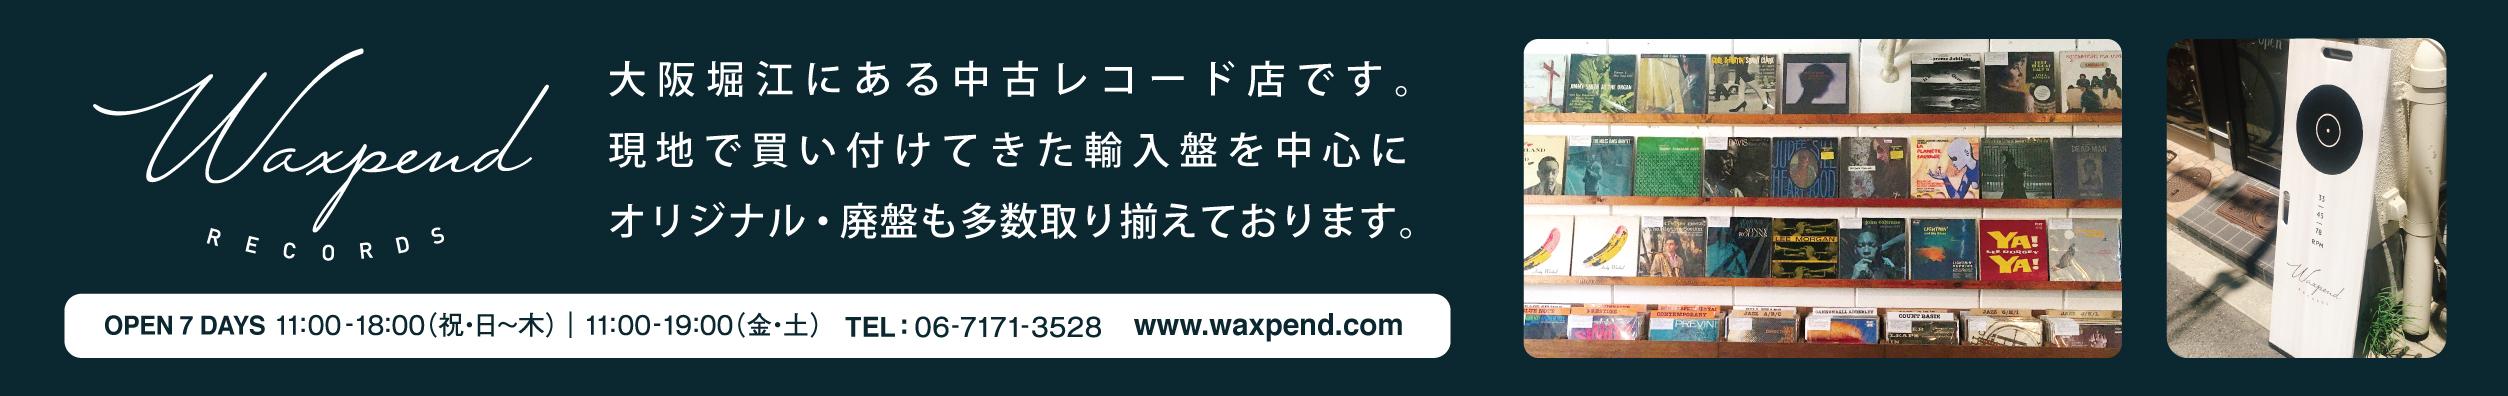 waxpend